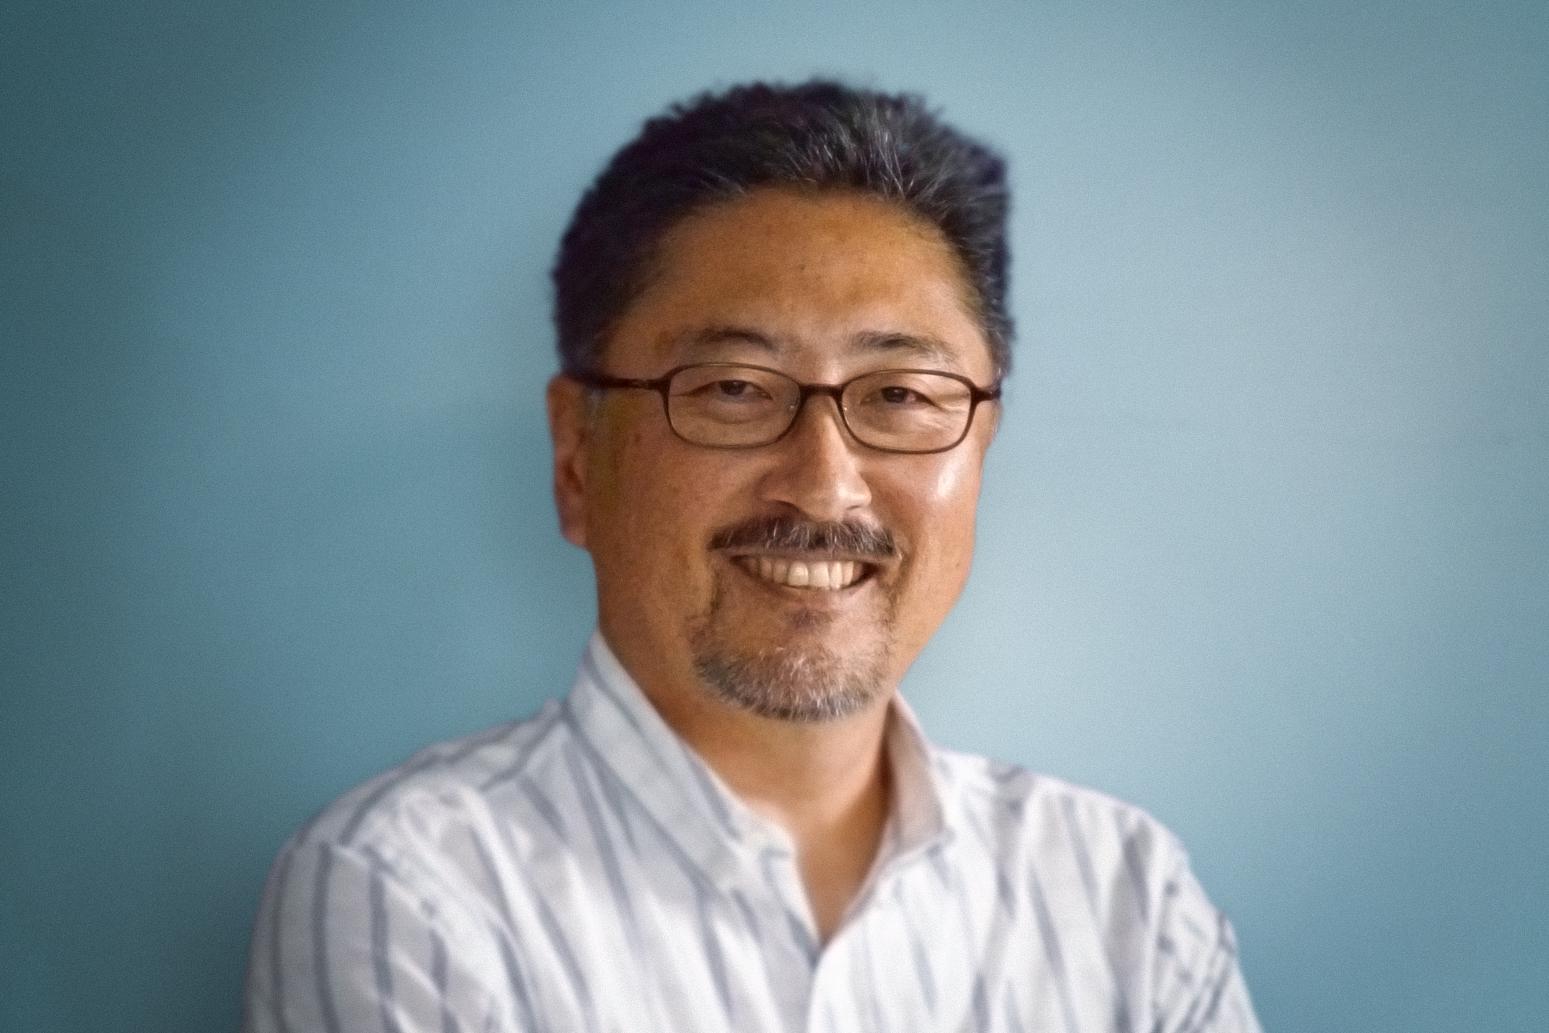 Kennosuke Saito